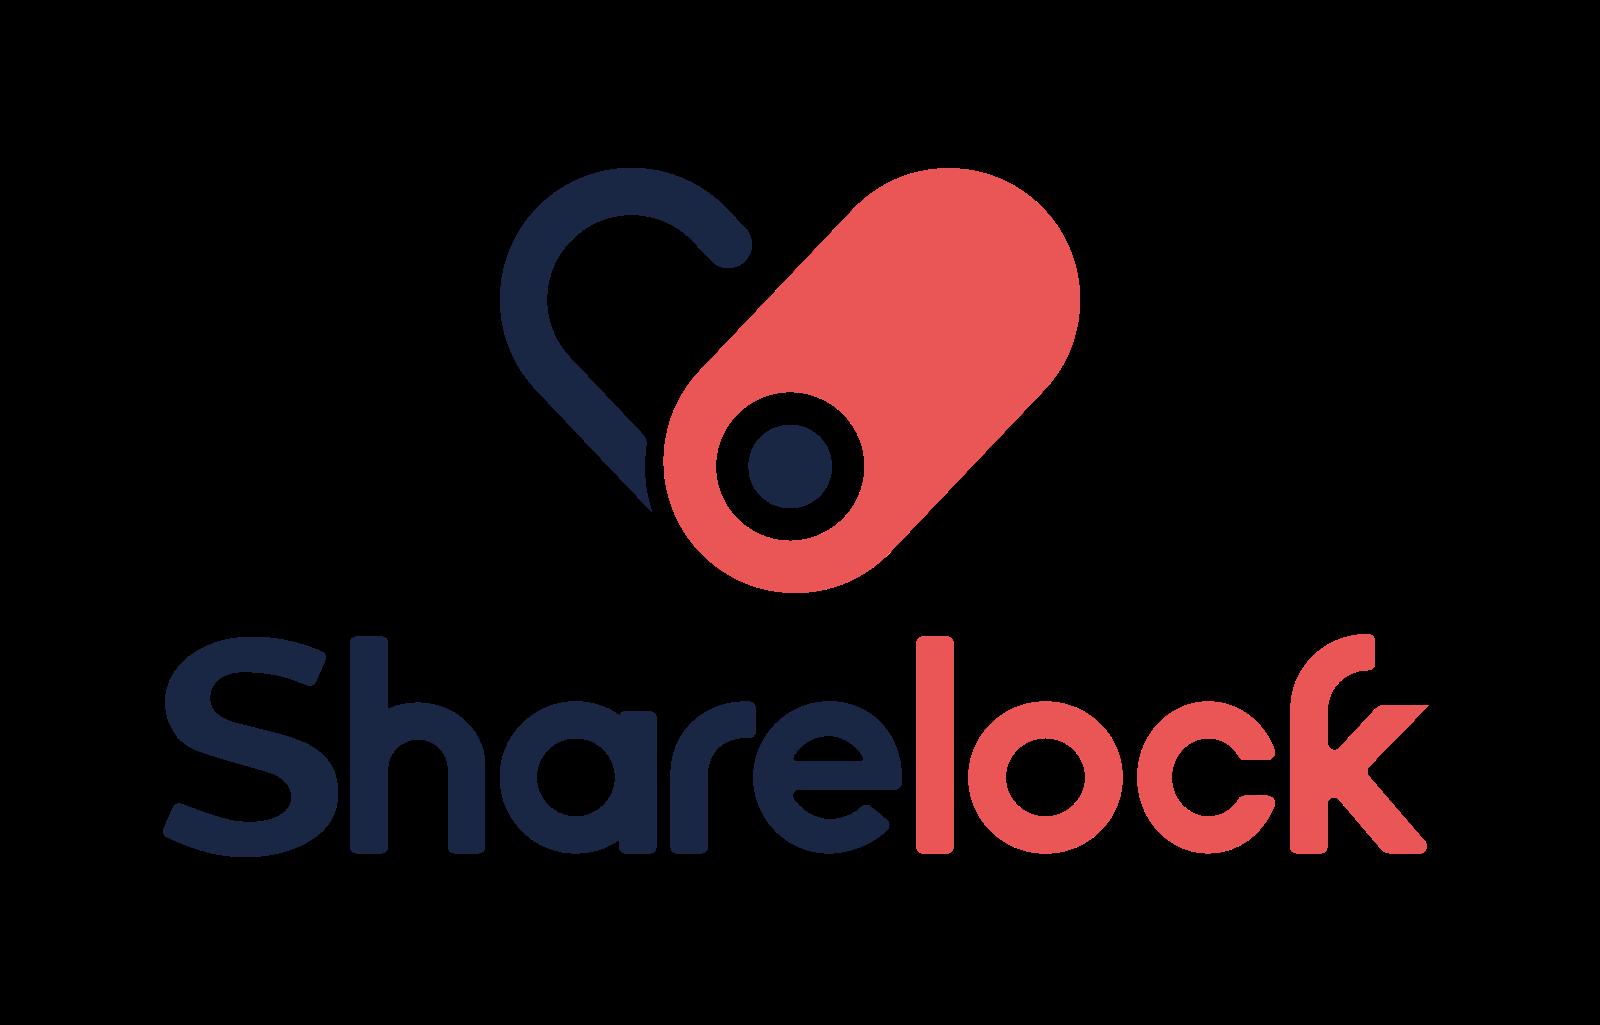 Share lock logo png